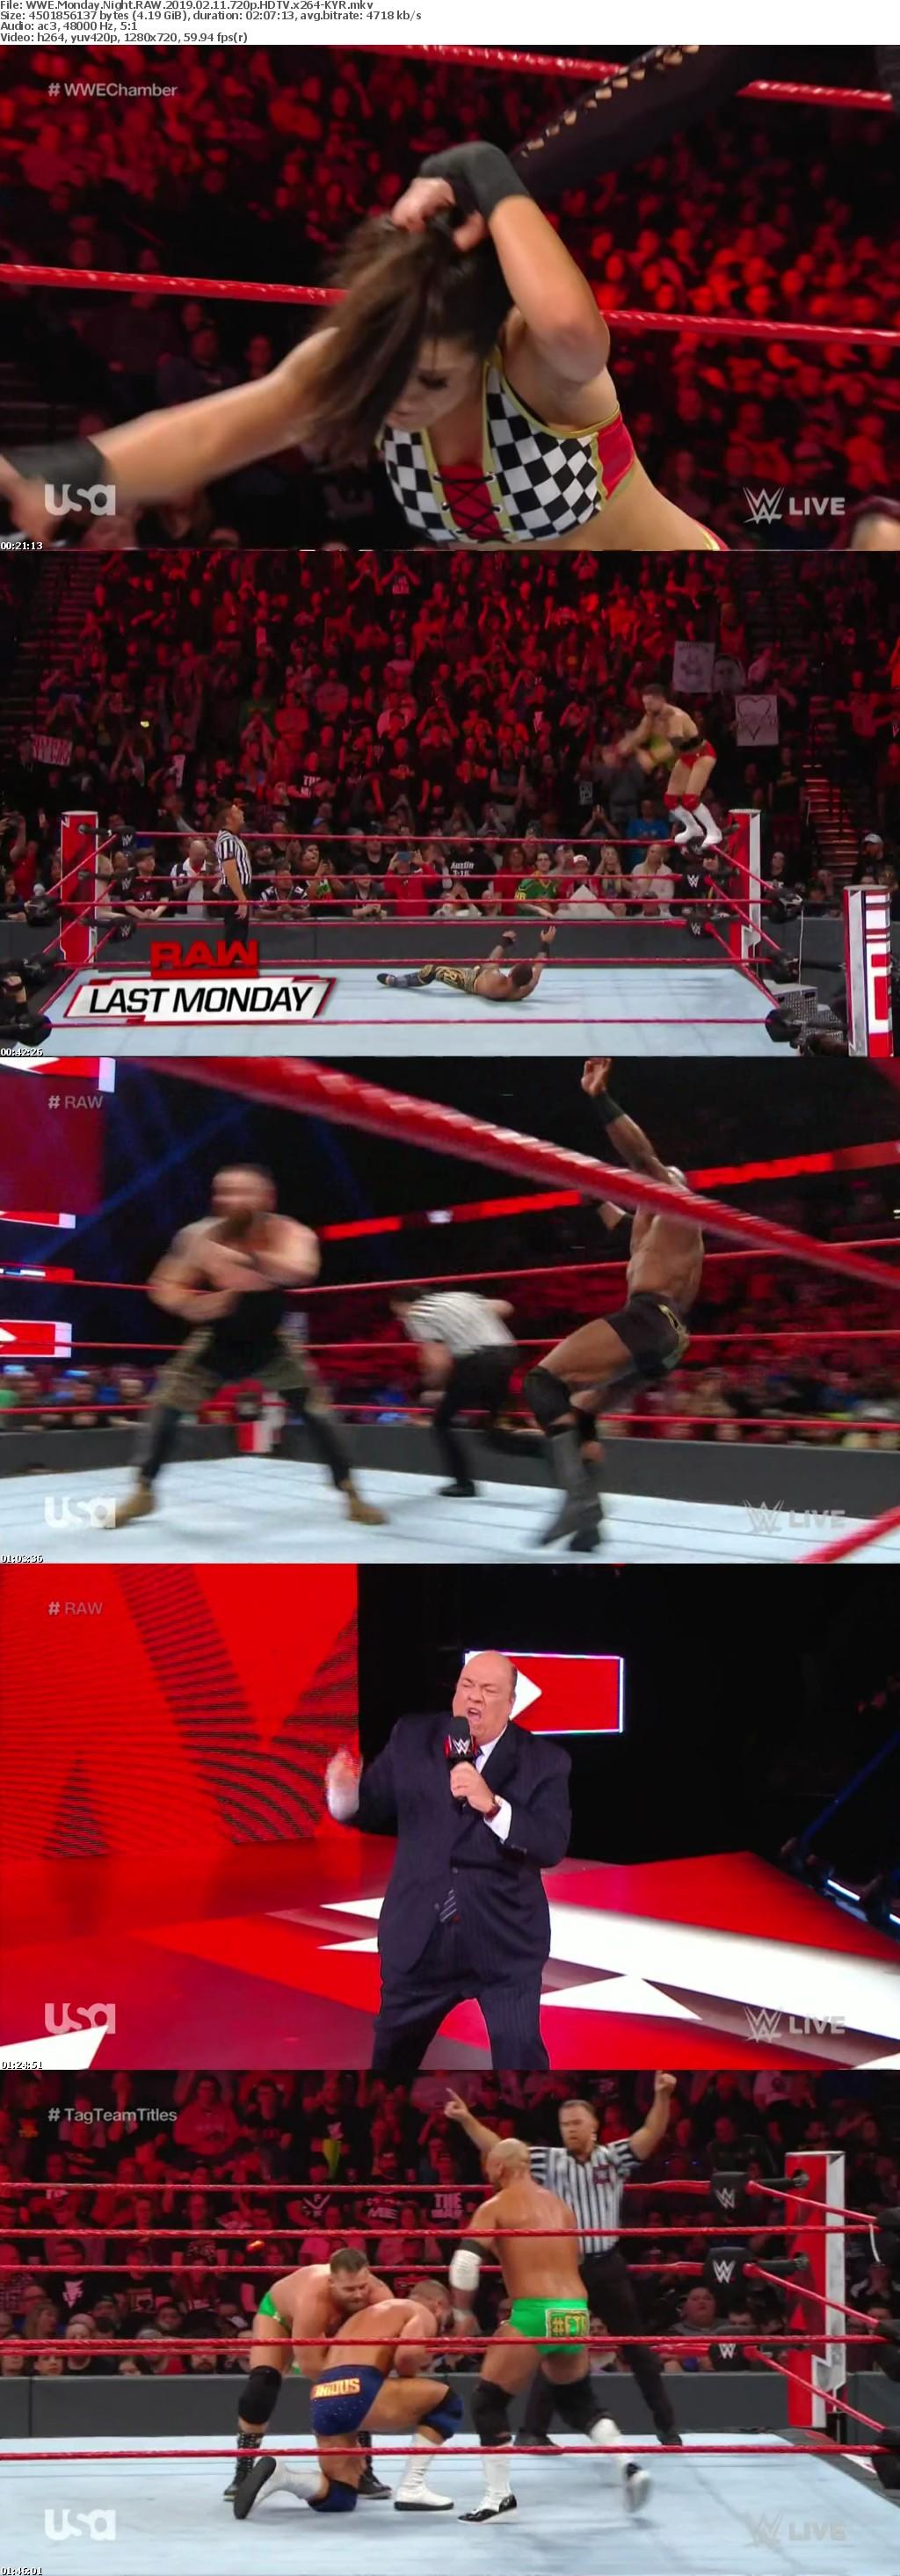 WWE Monday Night RAW 2019 02 11 720p HDTV x264-KYR